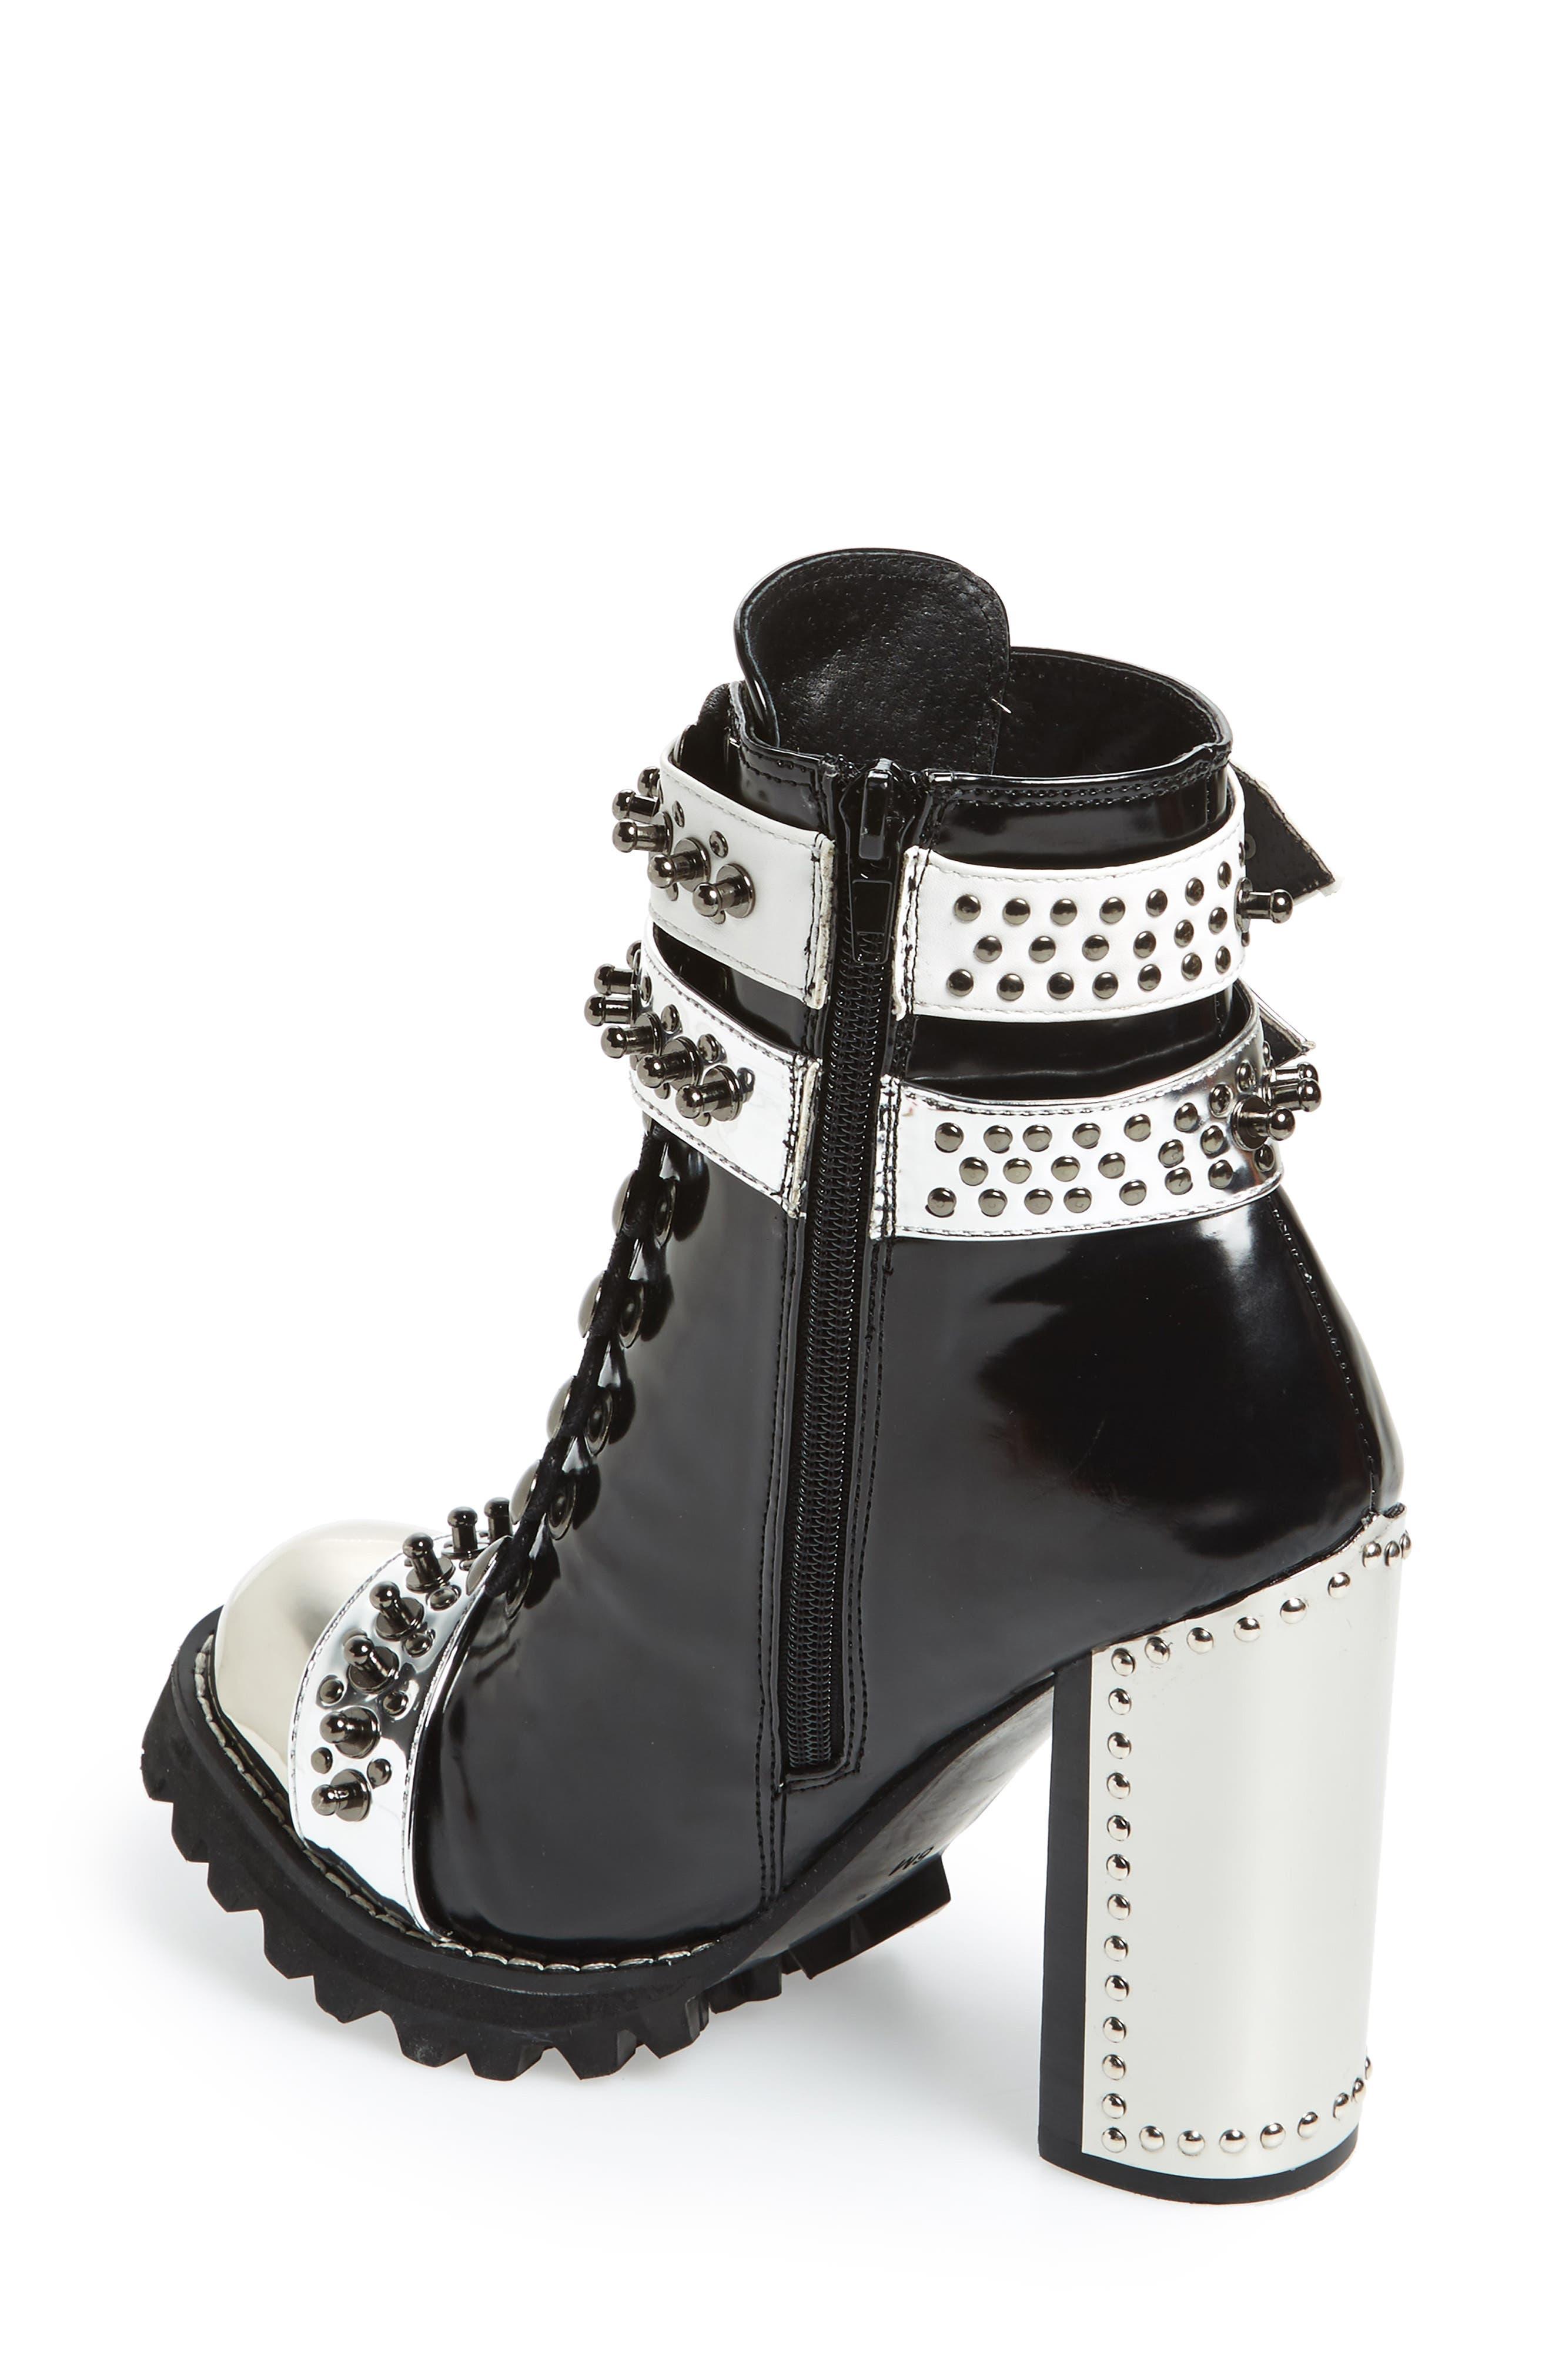 Scorpius Armored Lug Boot,                             Alternate thumbnail 2, color,                             Black Box Silver White